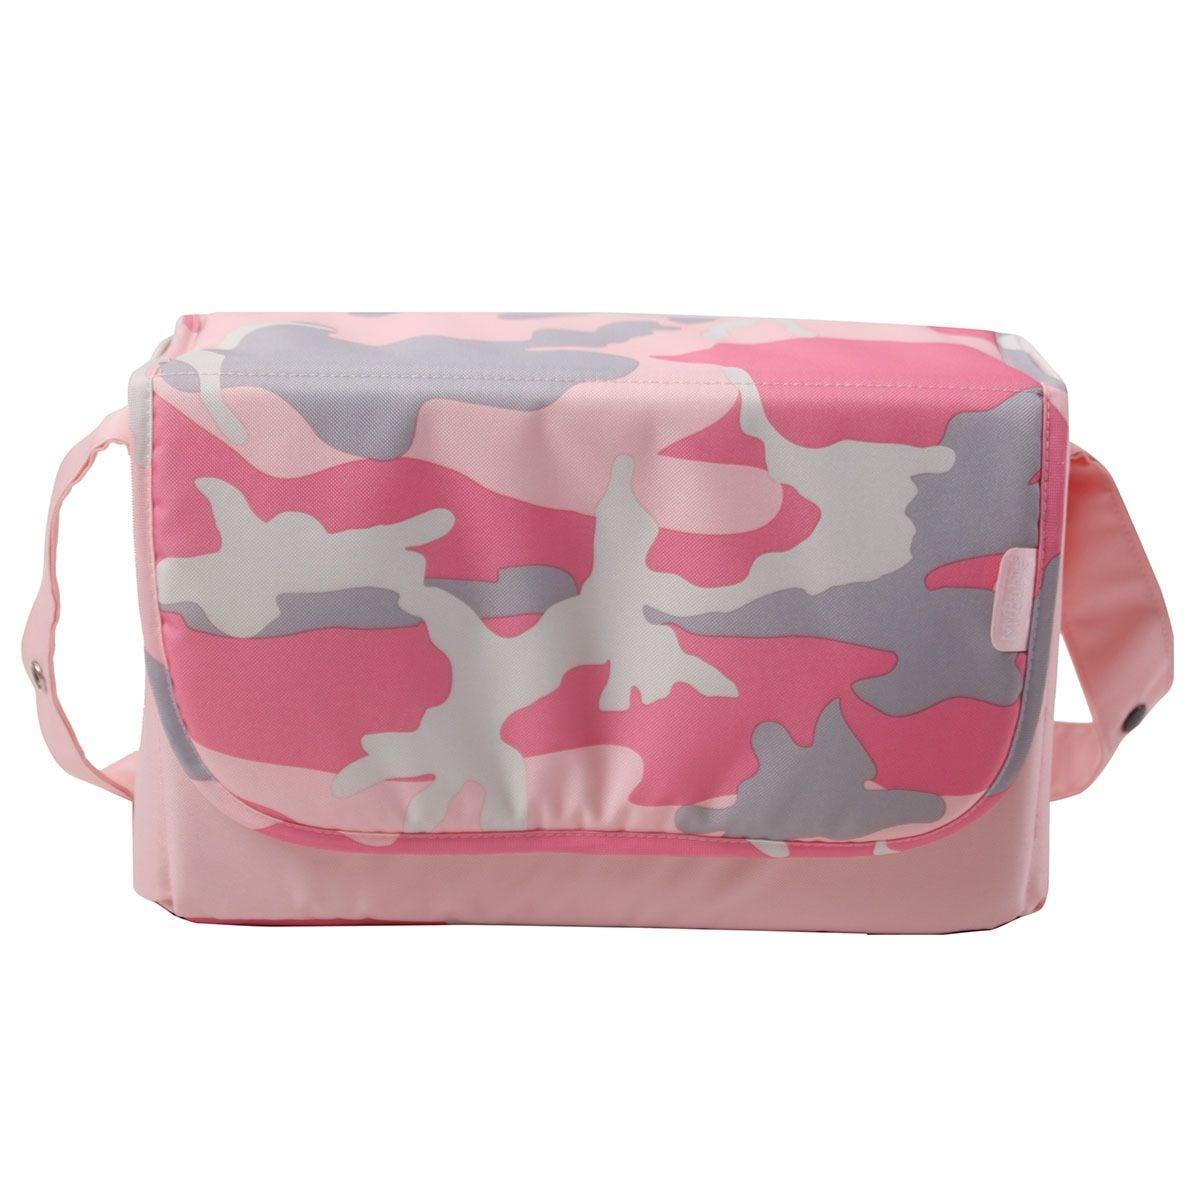 My Babiie Changing Bag - Pink Camo